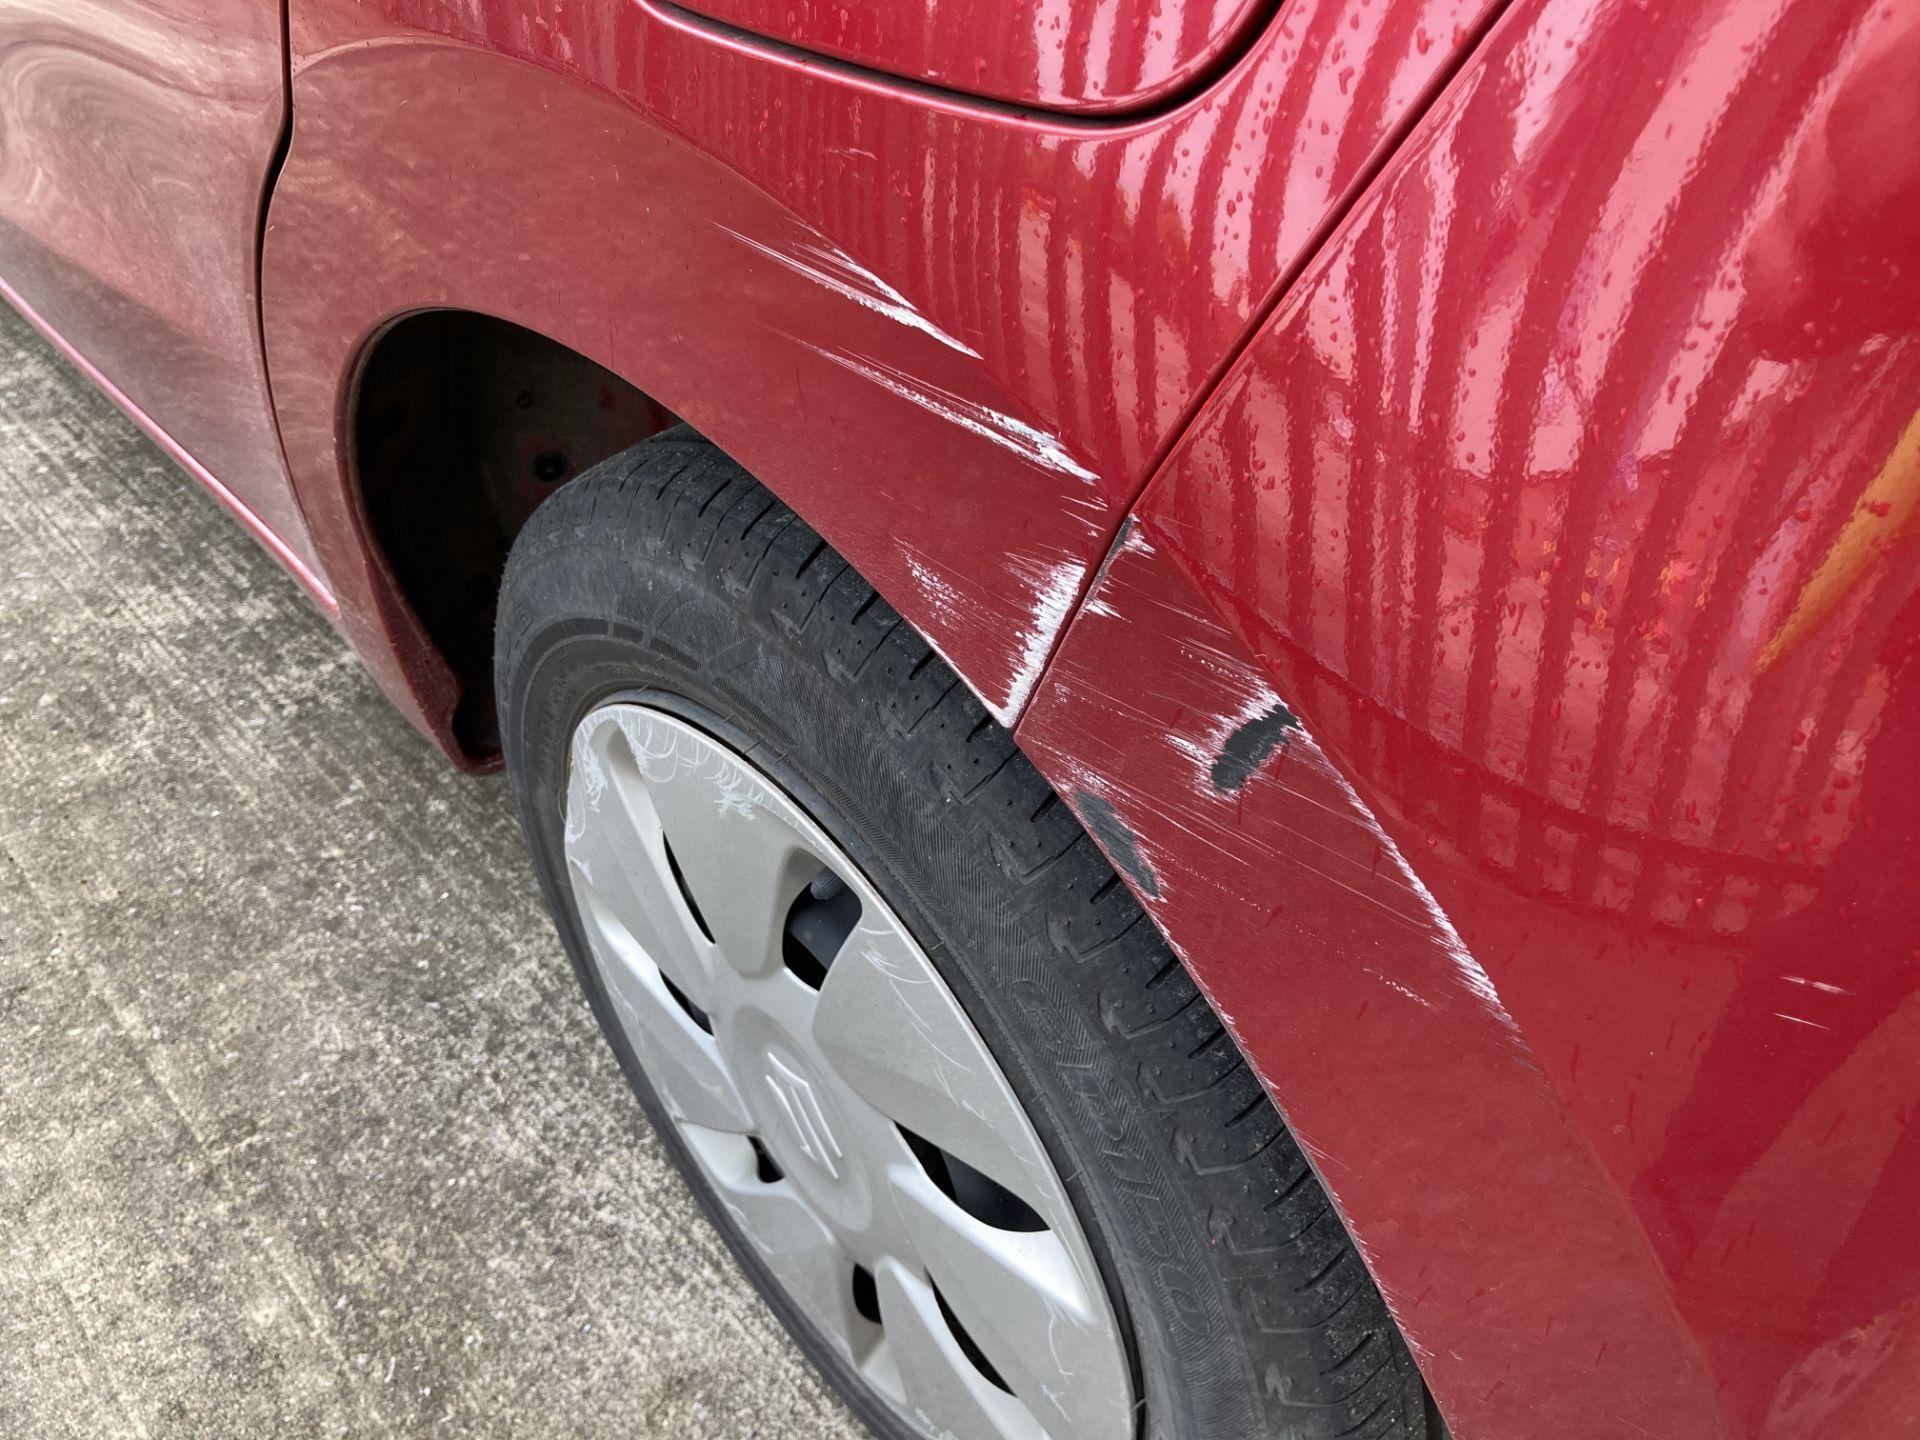 ON INSTRUCTIONS OF THE INSOLVENCY SERVICE SUZUKI CELERIO SZ2 5 door hatchback - petrol - red Reg - Image 5 of 15